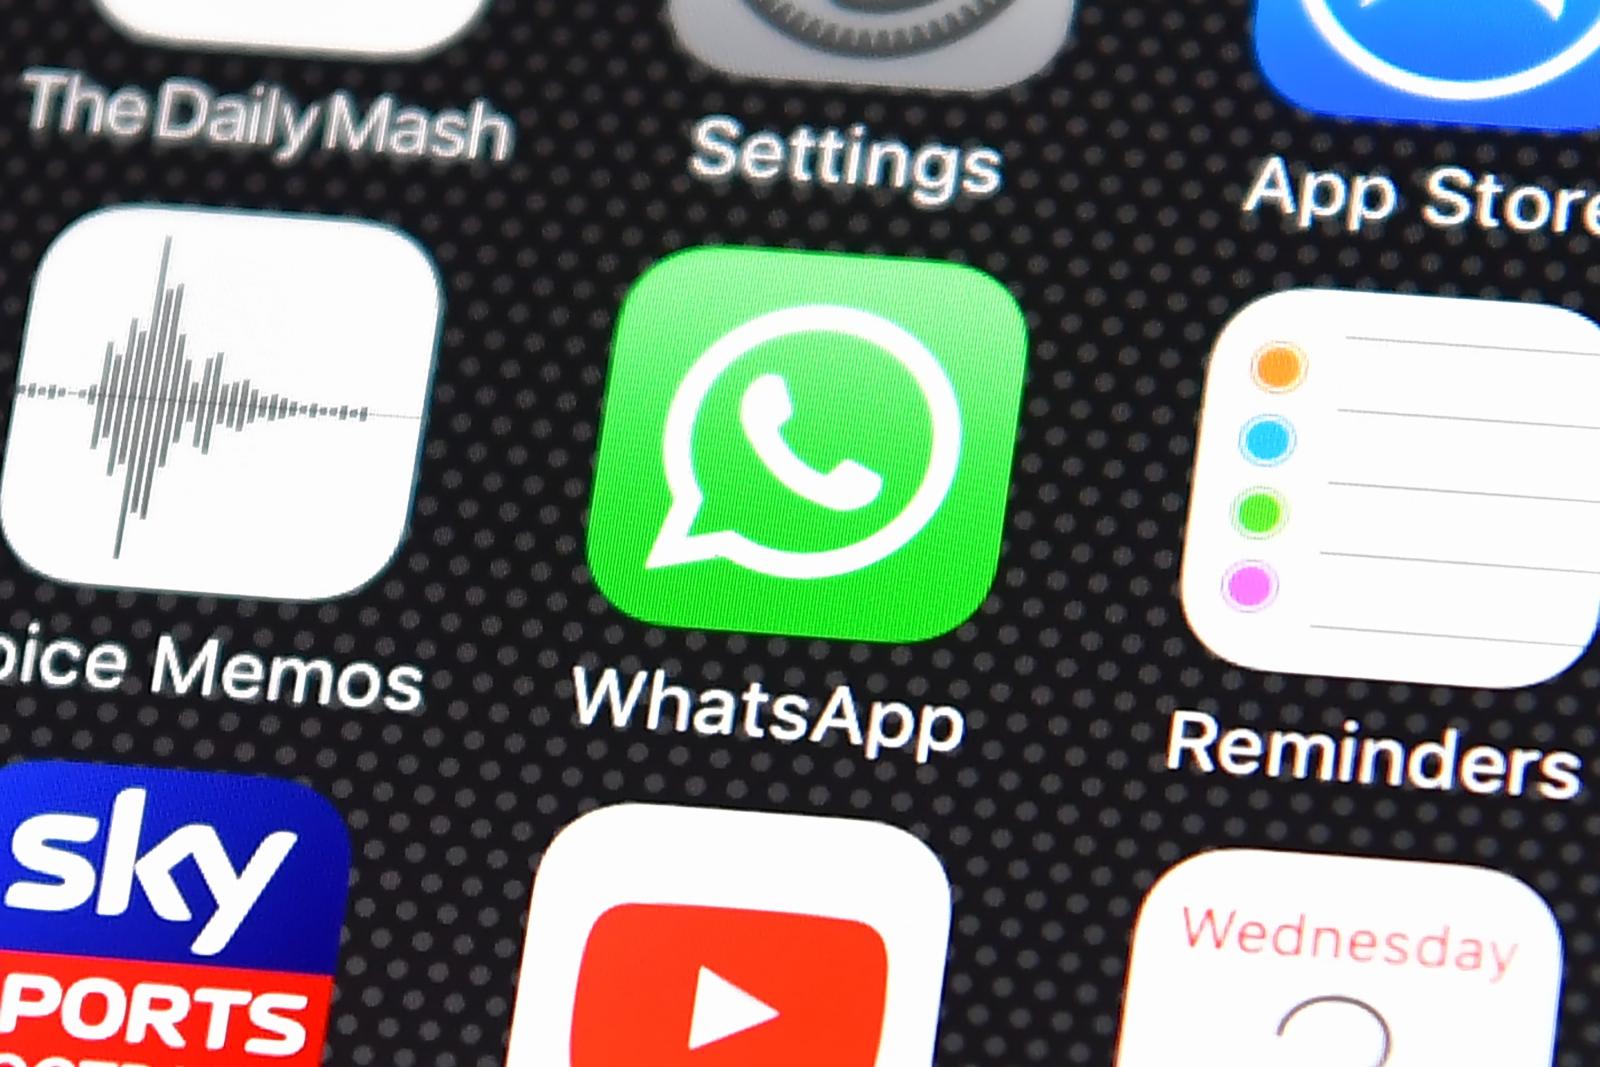 WhatsApp fined €3m over data sharing